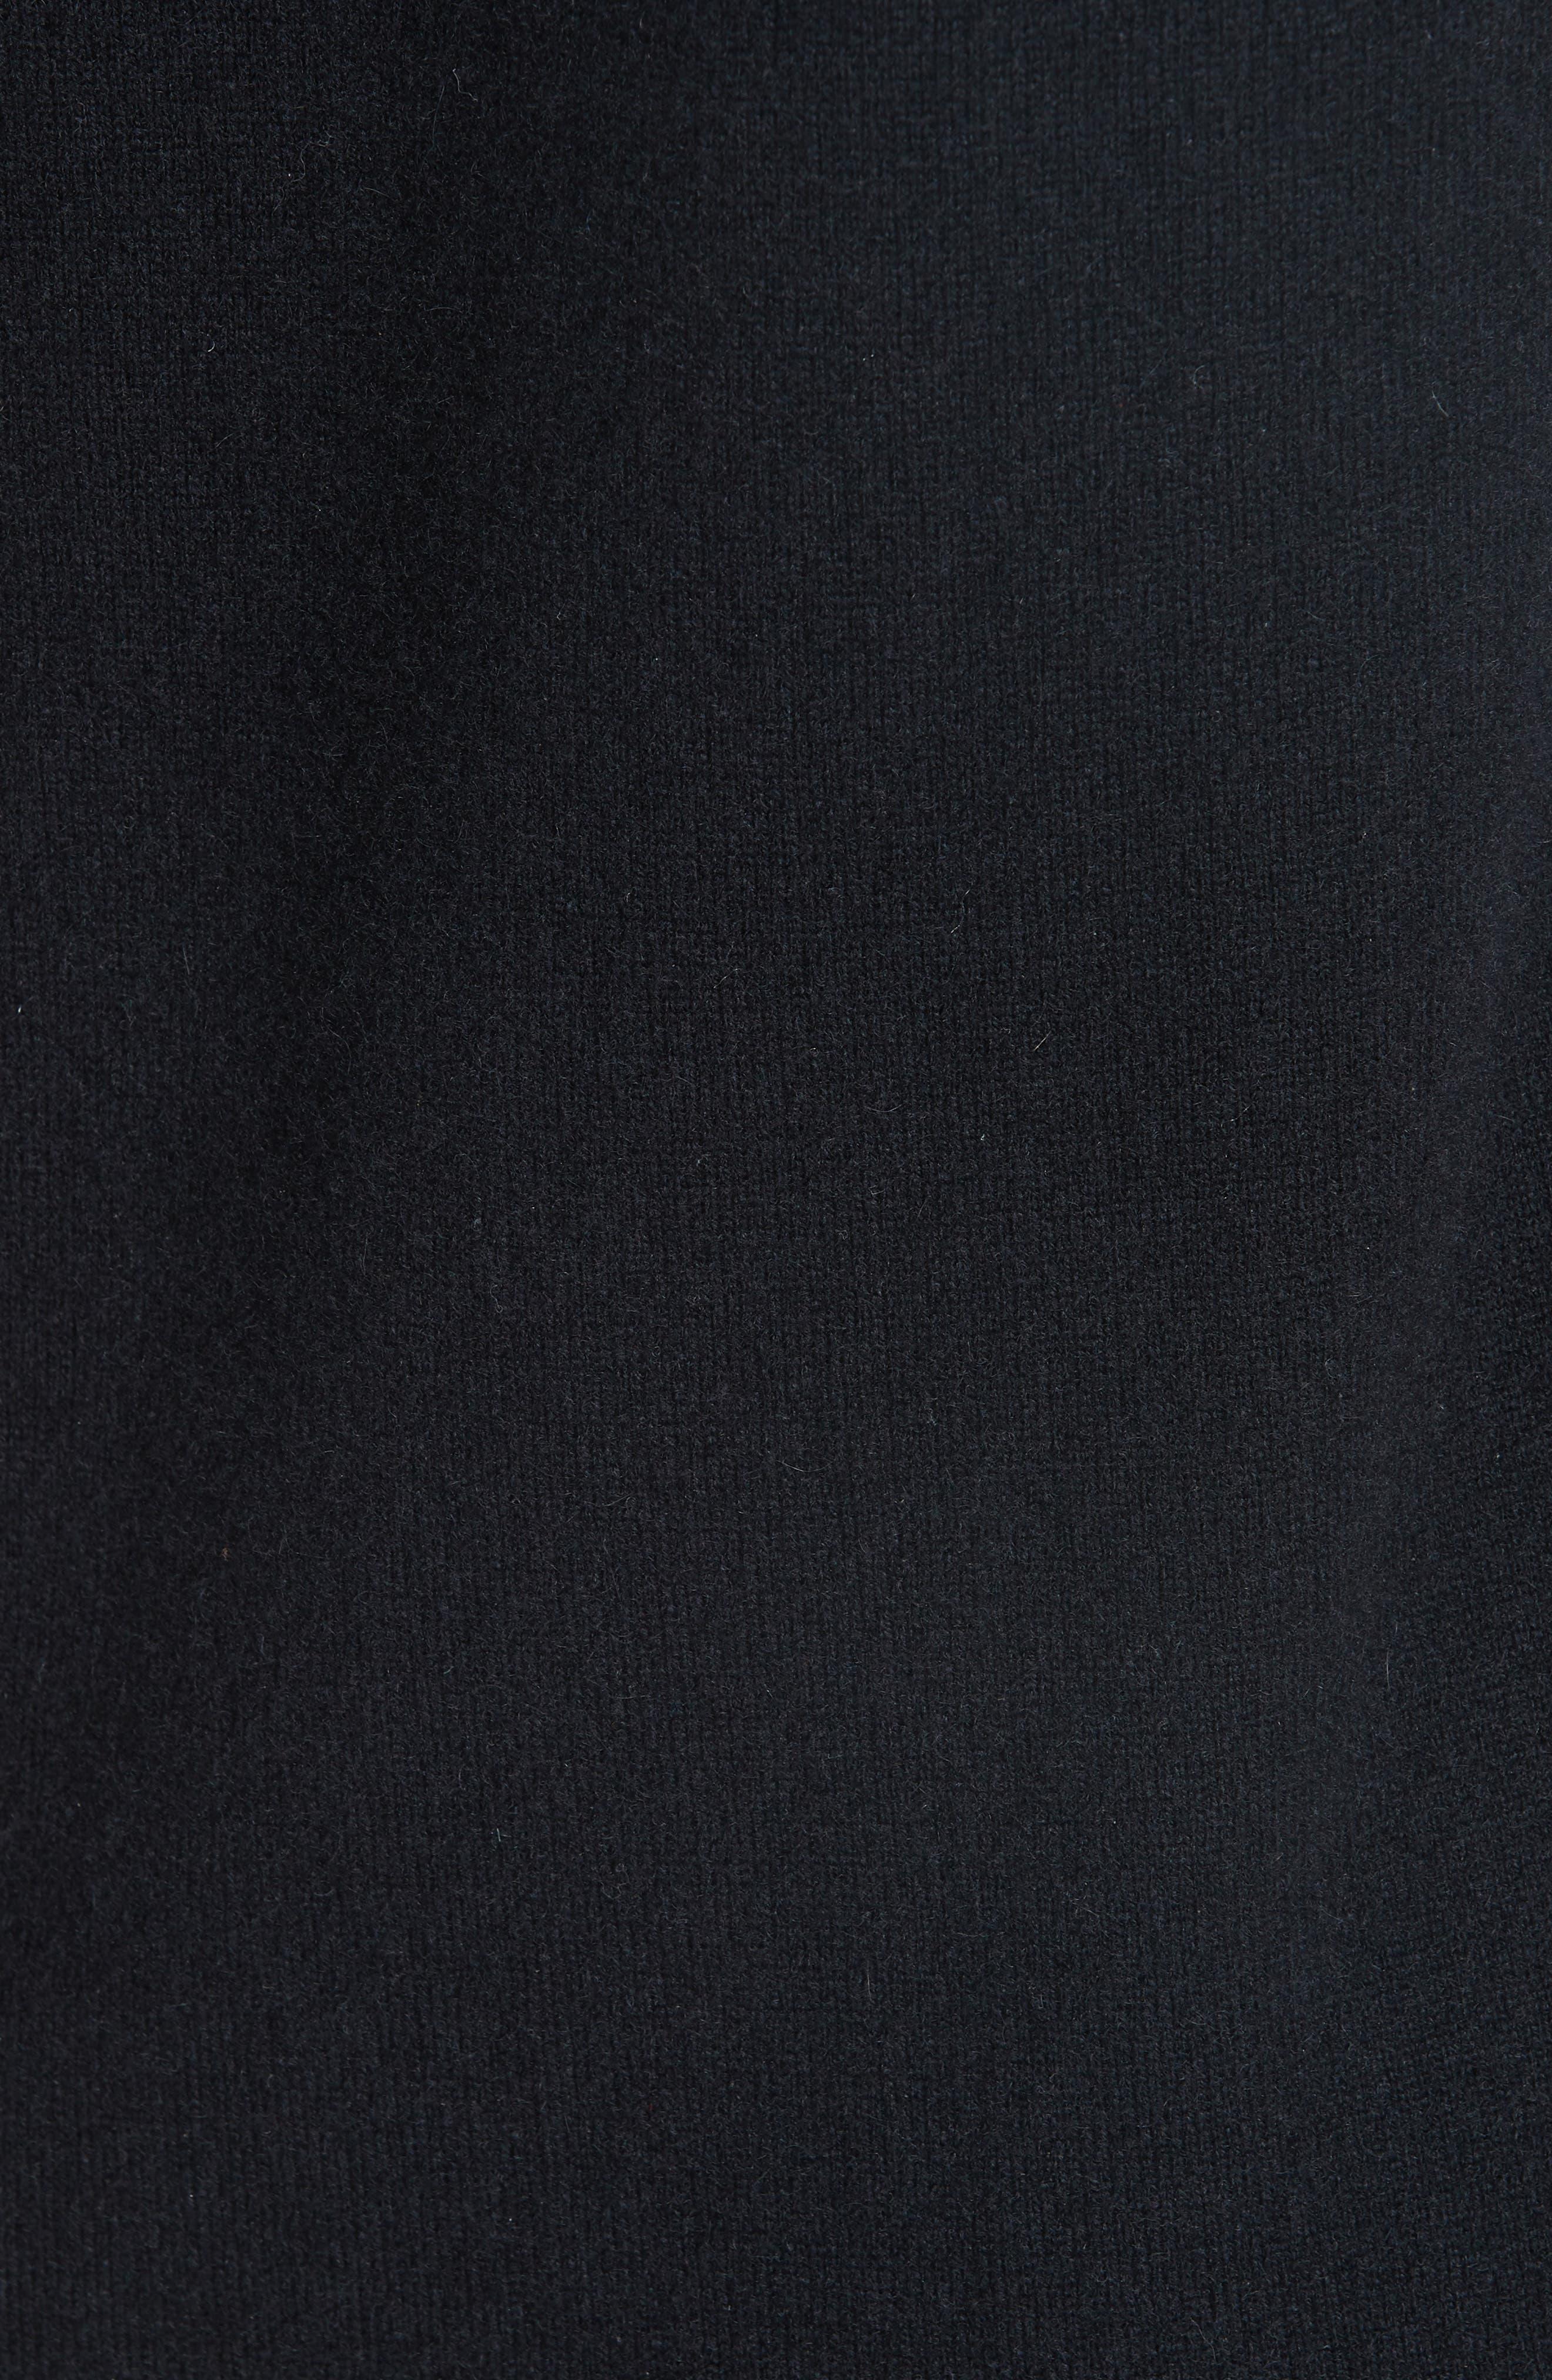 Cashmere Blend Hoodie Dress,                             Alternate thumbnail 6, color,                             BLACK